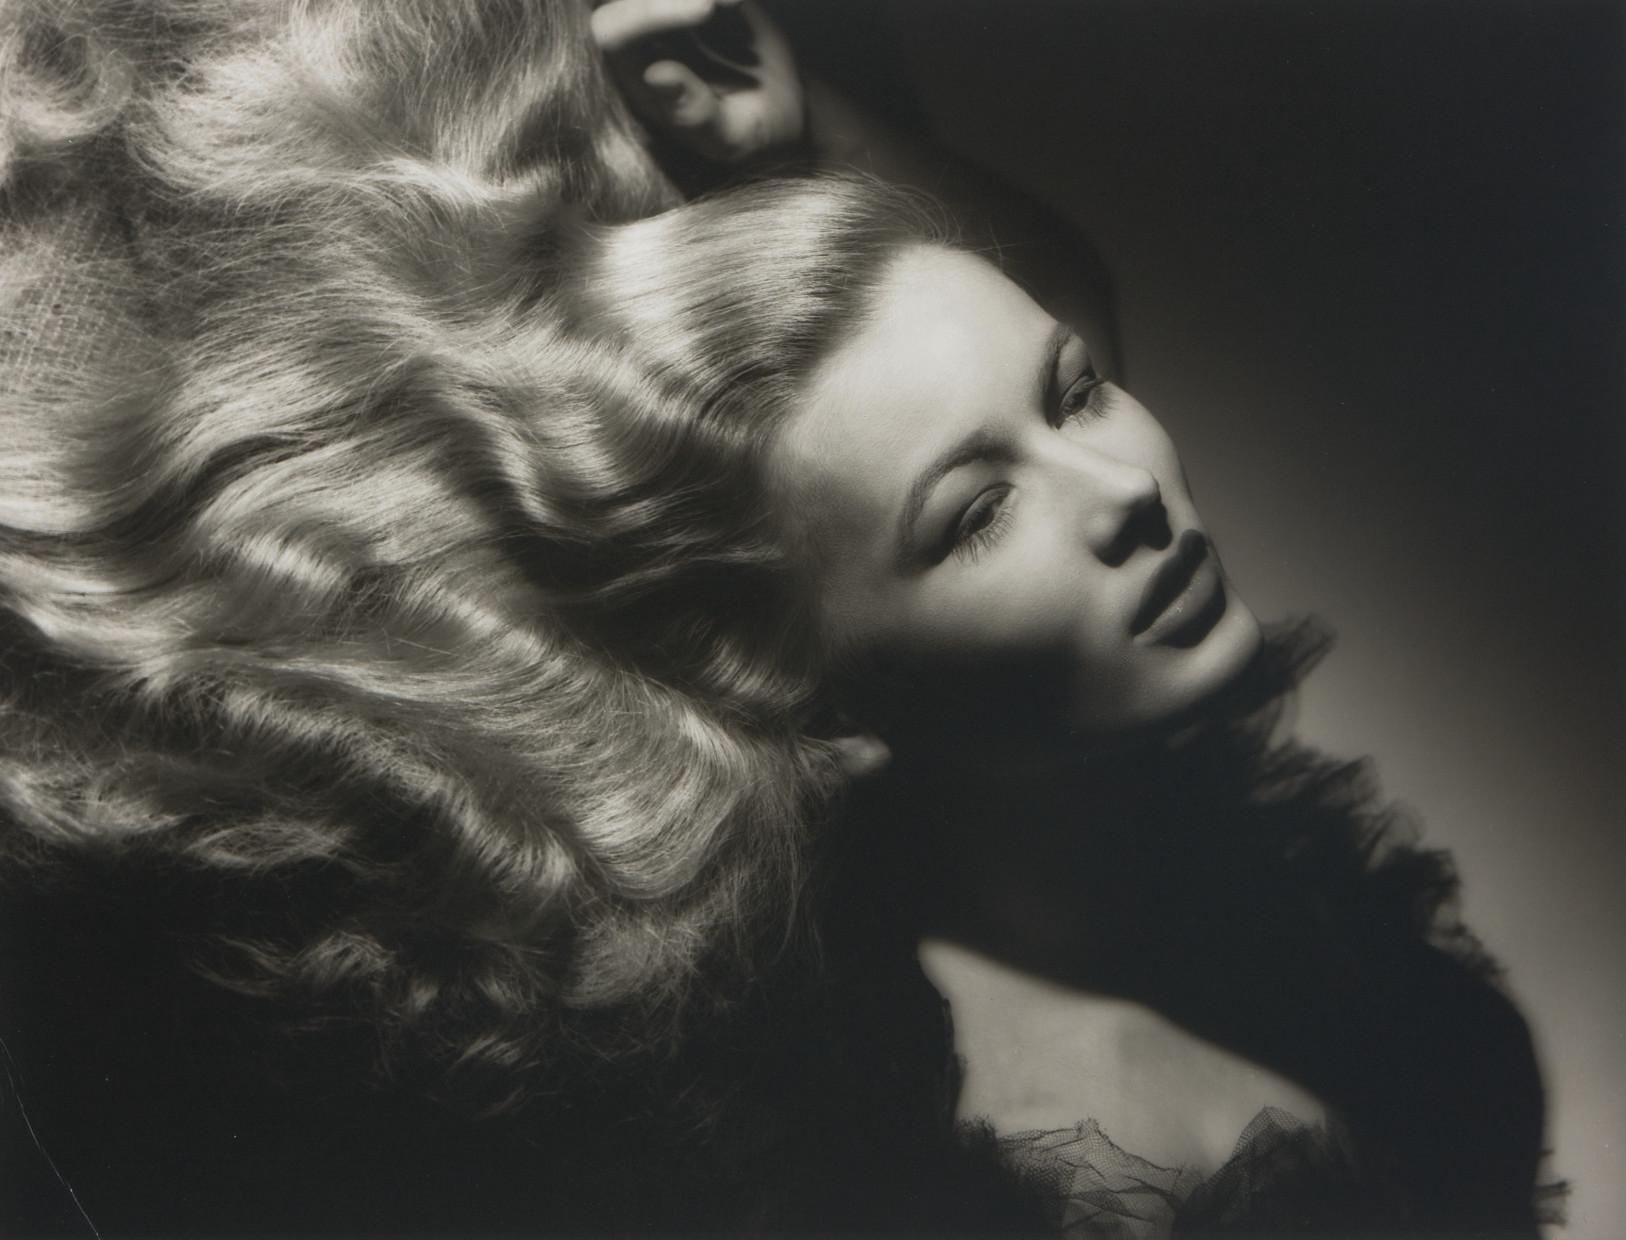 Portraits of Hollywood screen goddesses, Joan Crawford, Veronica Lake (illustrated), Rita Hayworth and Jane Russell, 1932-1946